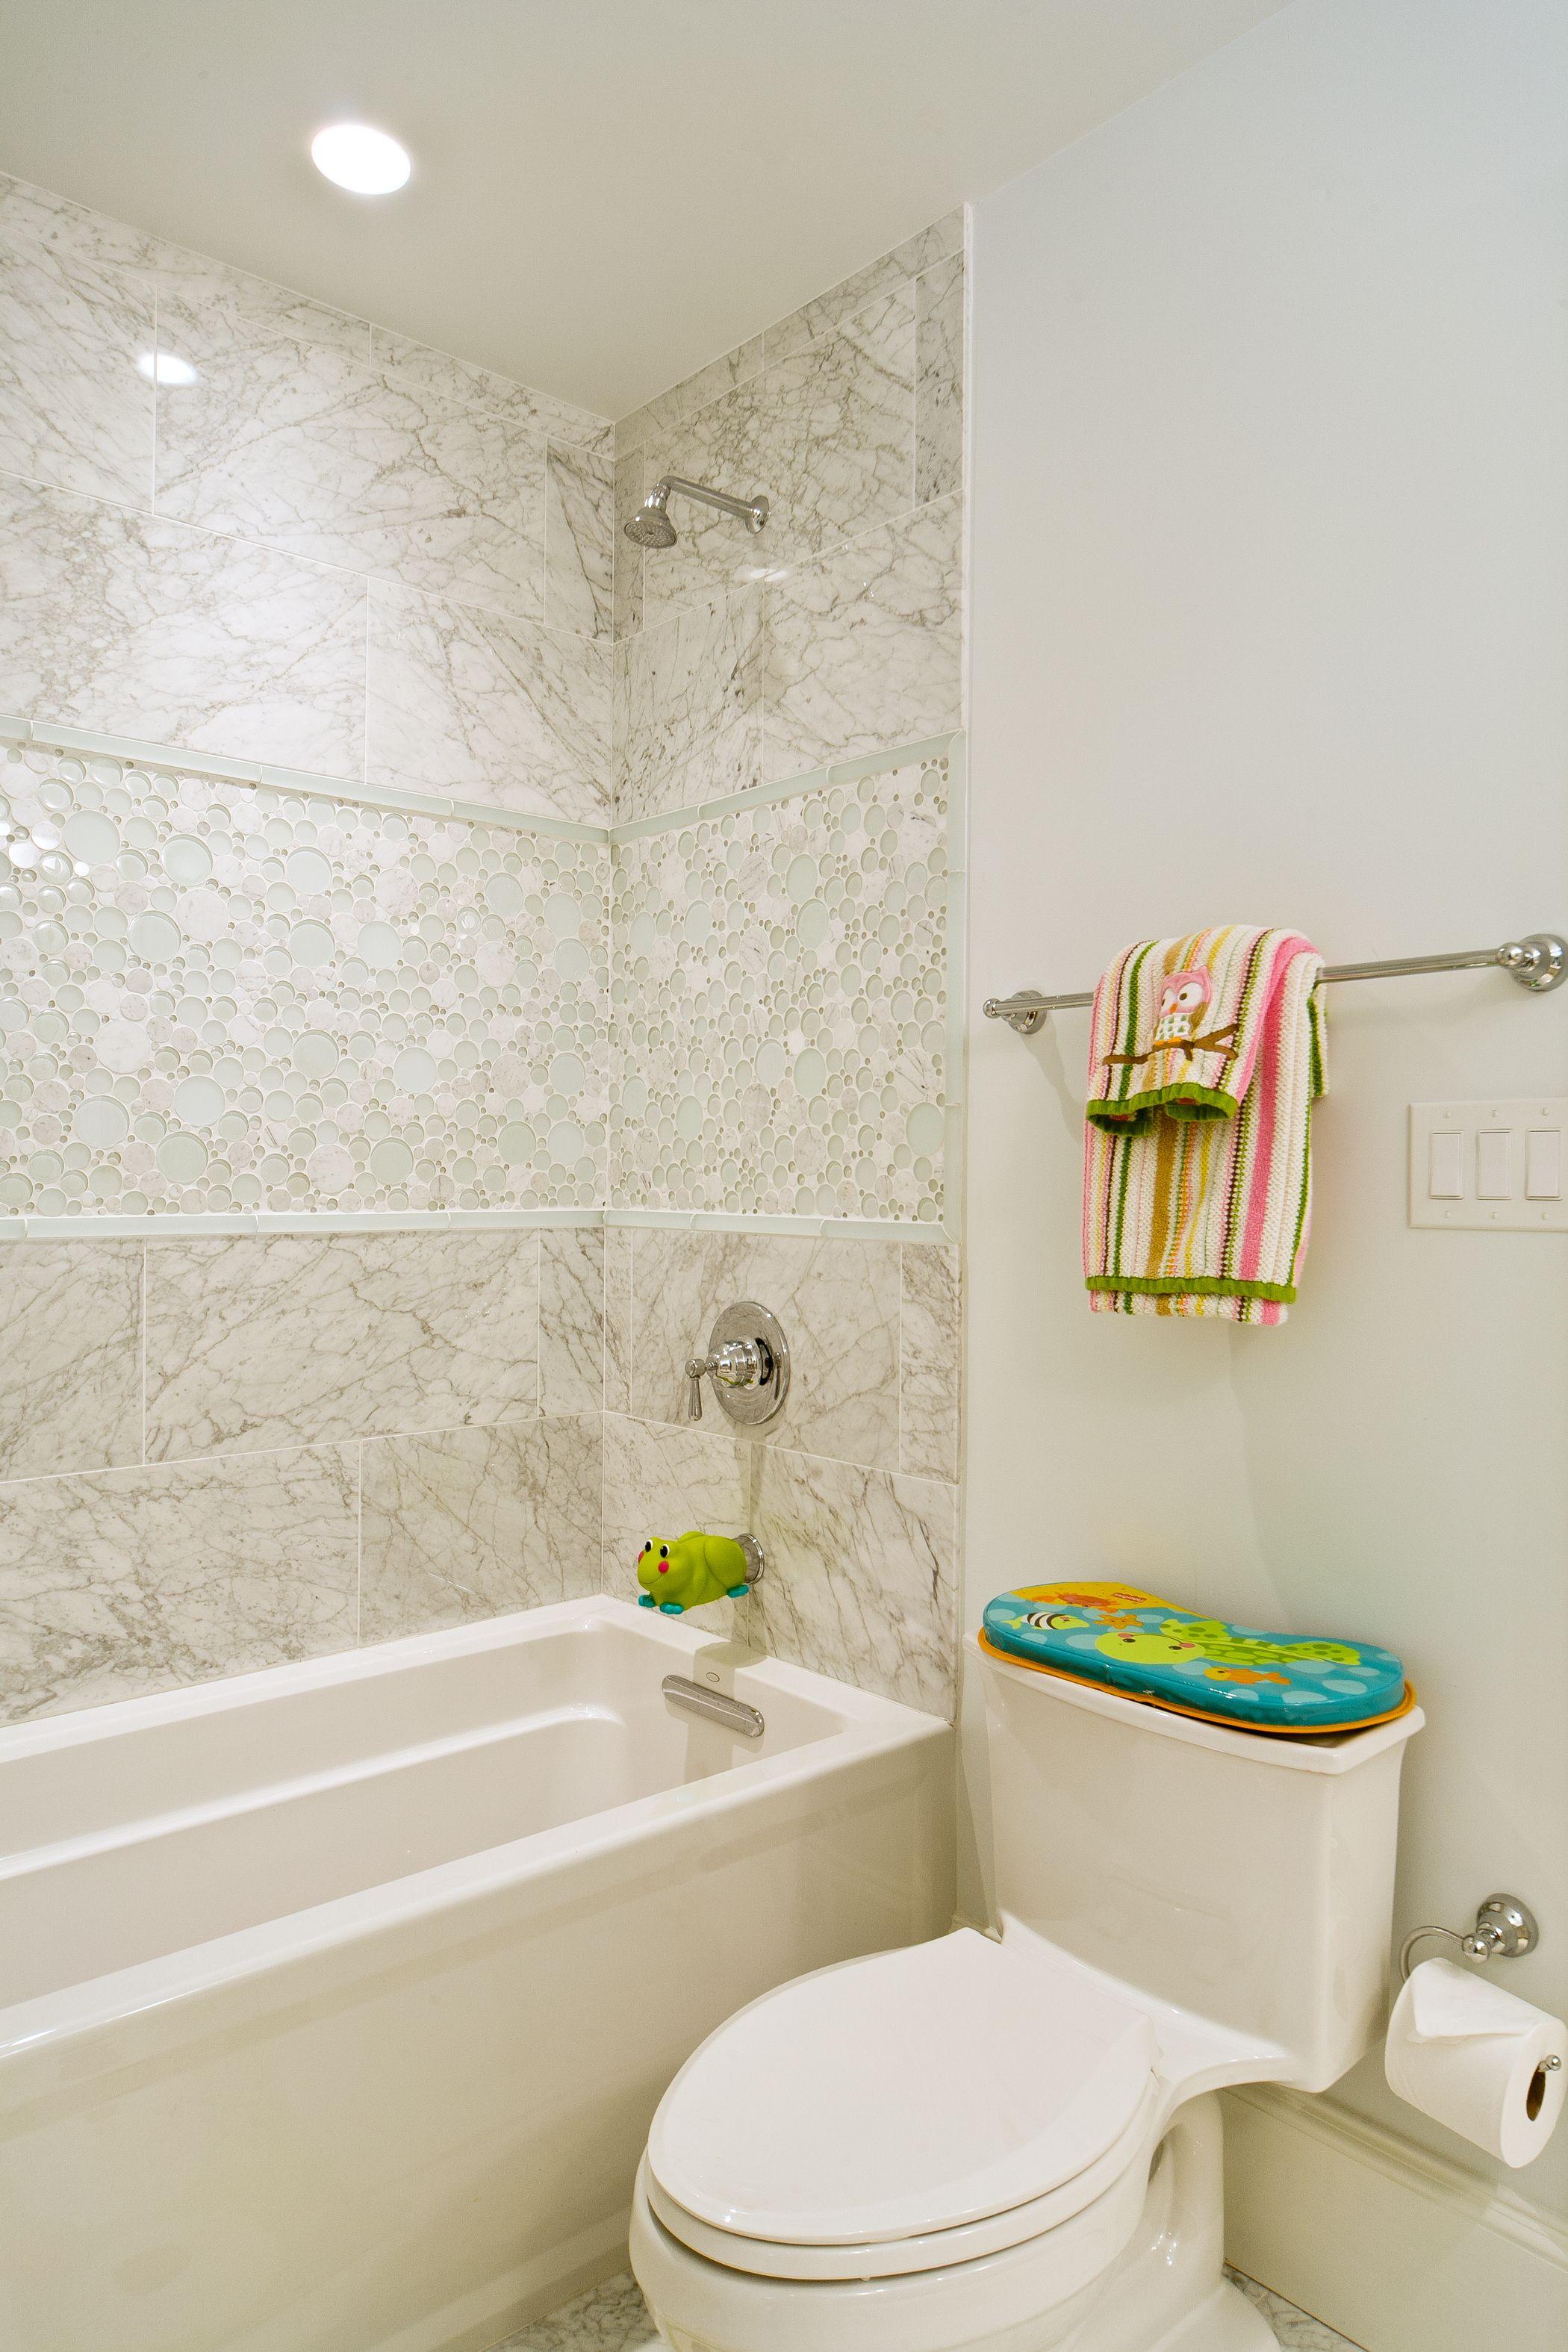 Great quality kids bathroom remodel built by J Allen Smith Design